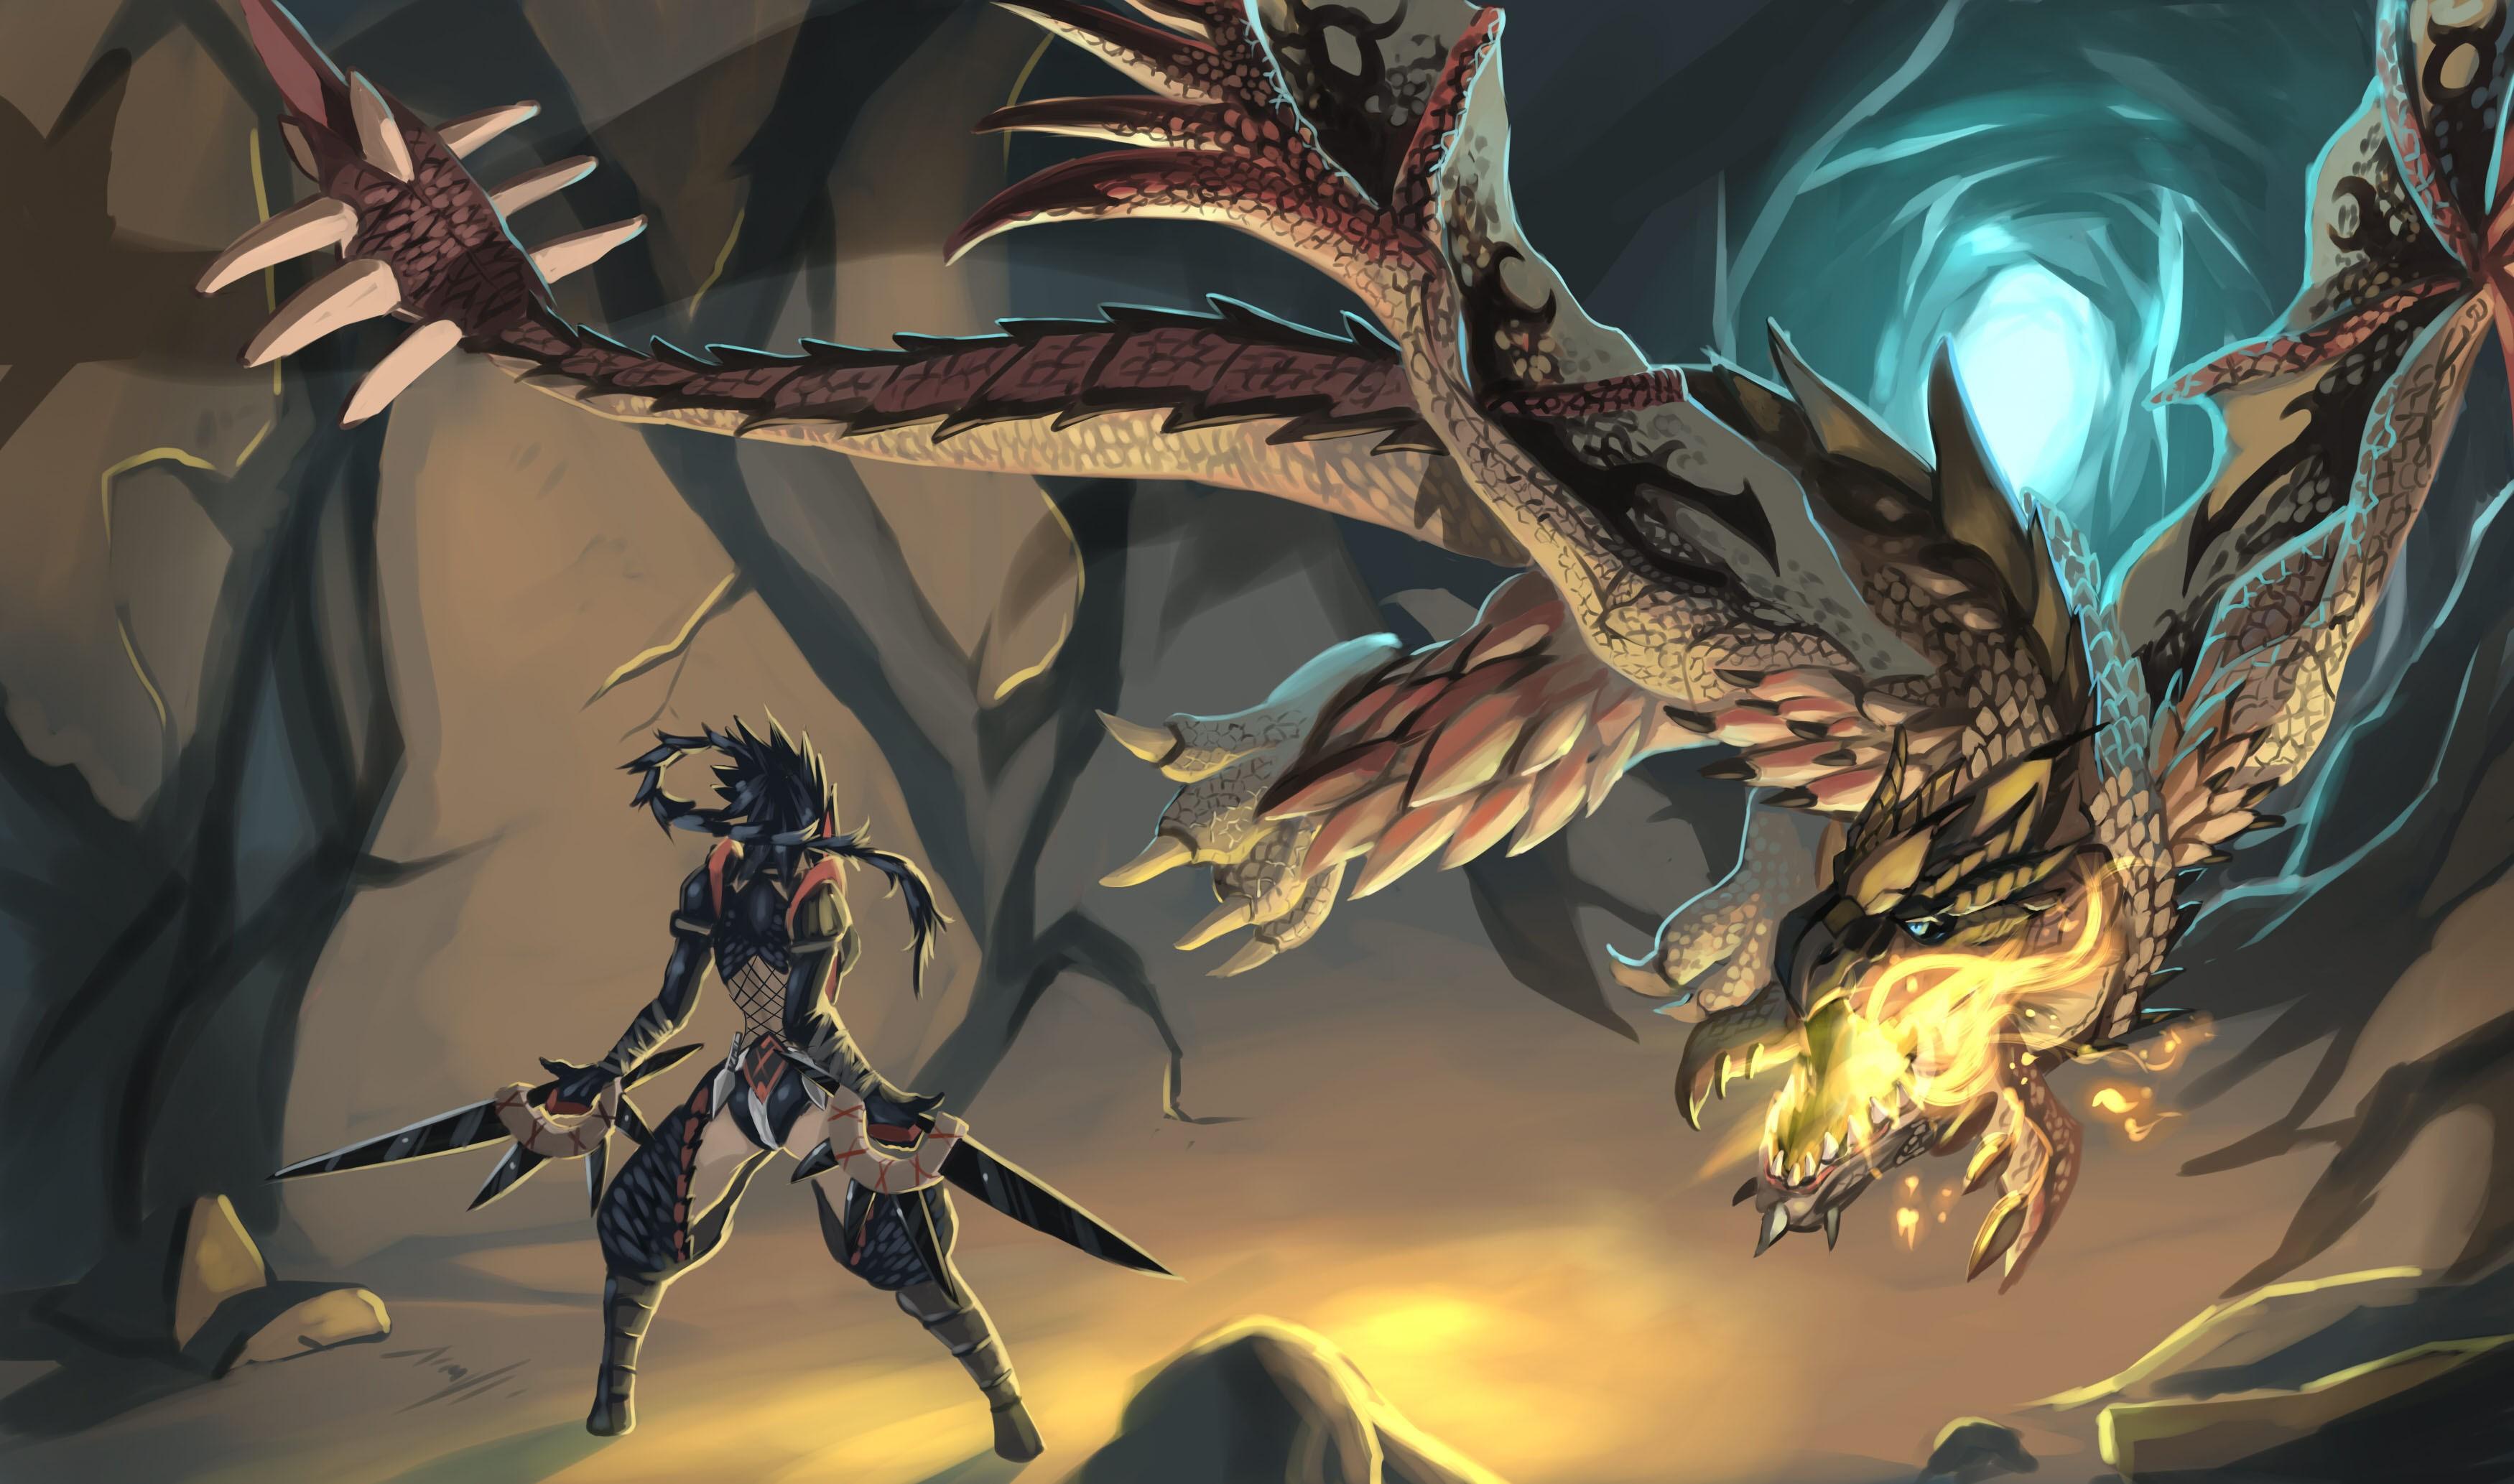 Wallpaper Anime Dragon Monster Hunter Comics Mythology